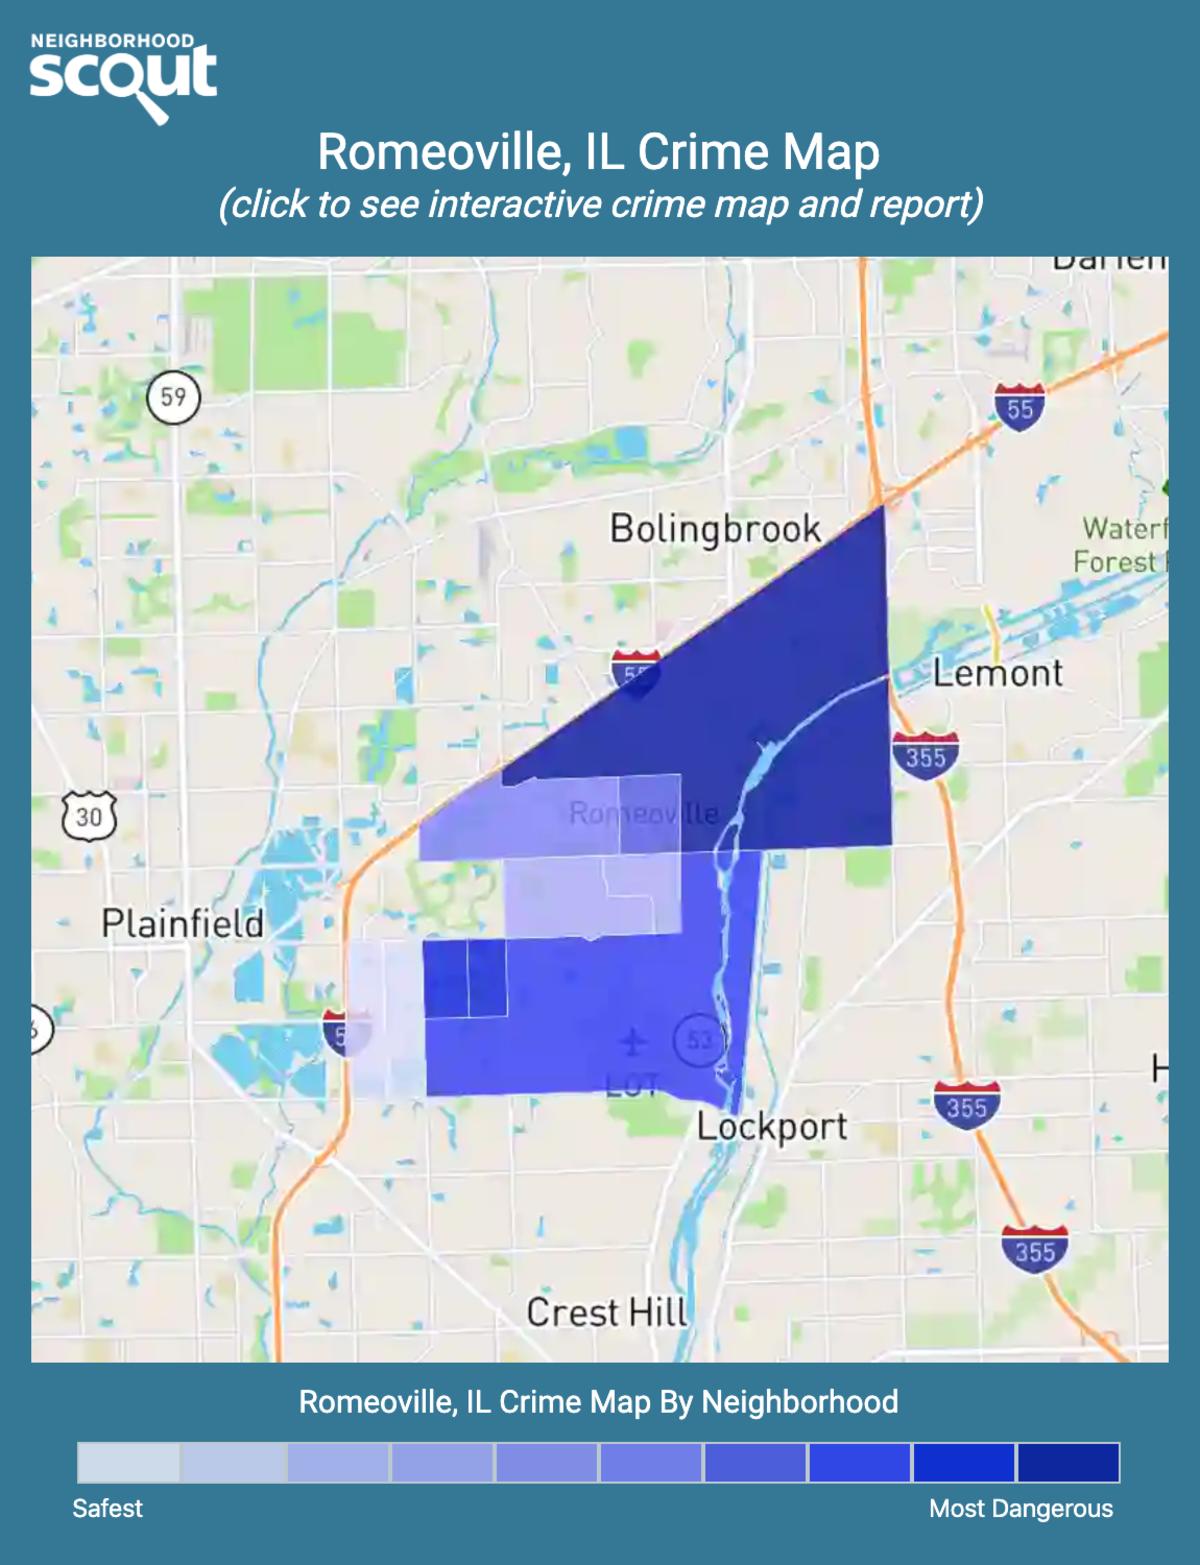 Romeoville, Illinois crime map